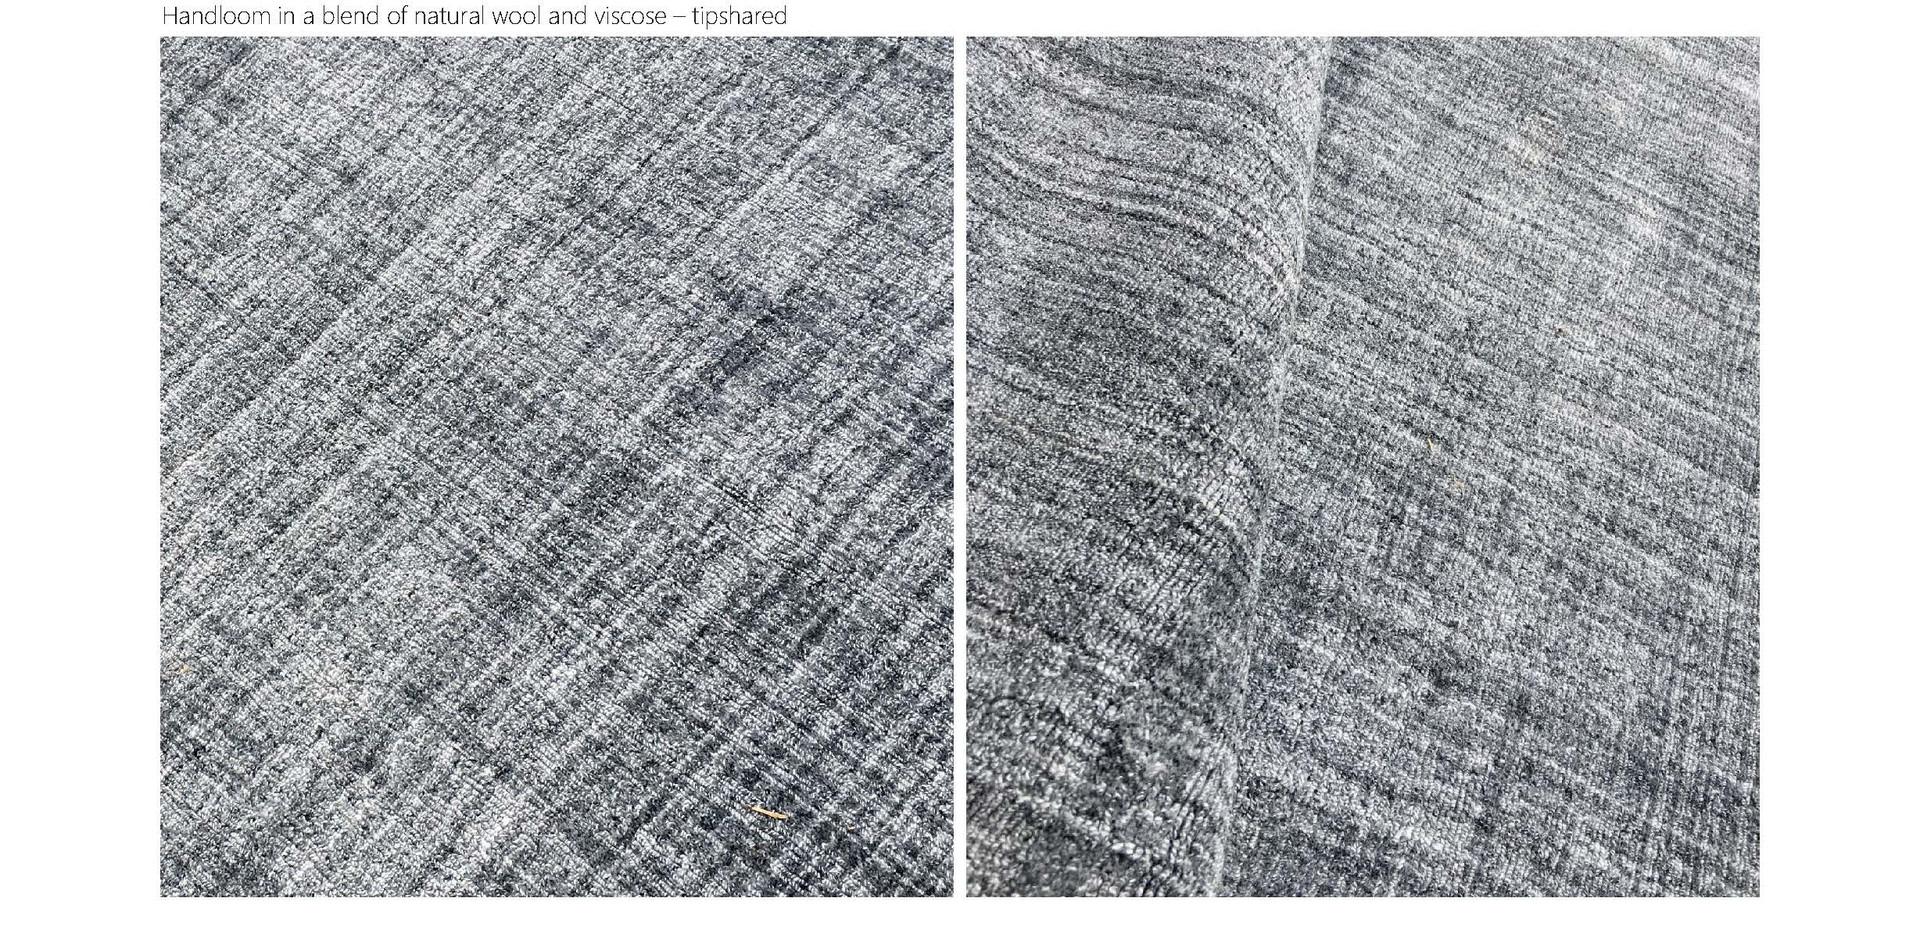 6. Handloom Basic Lines 07.jpg